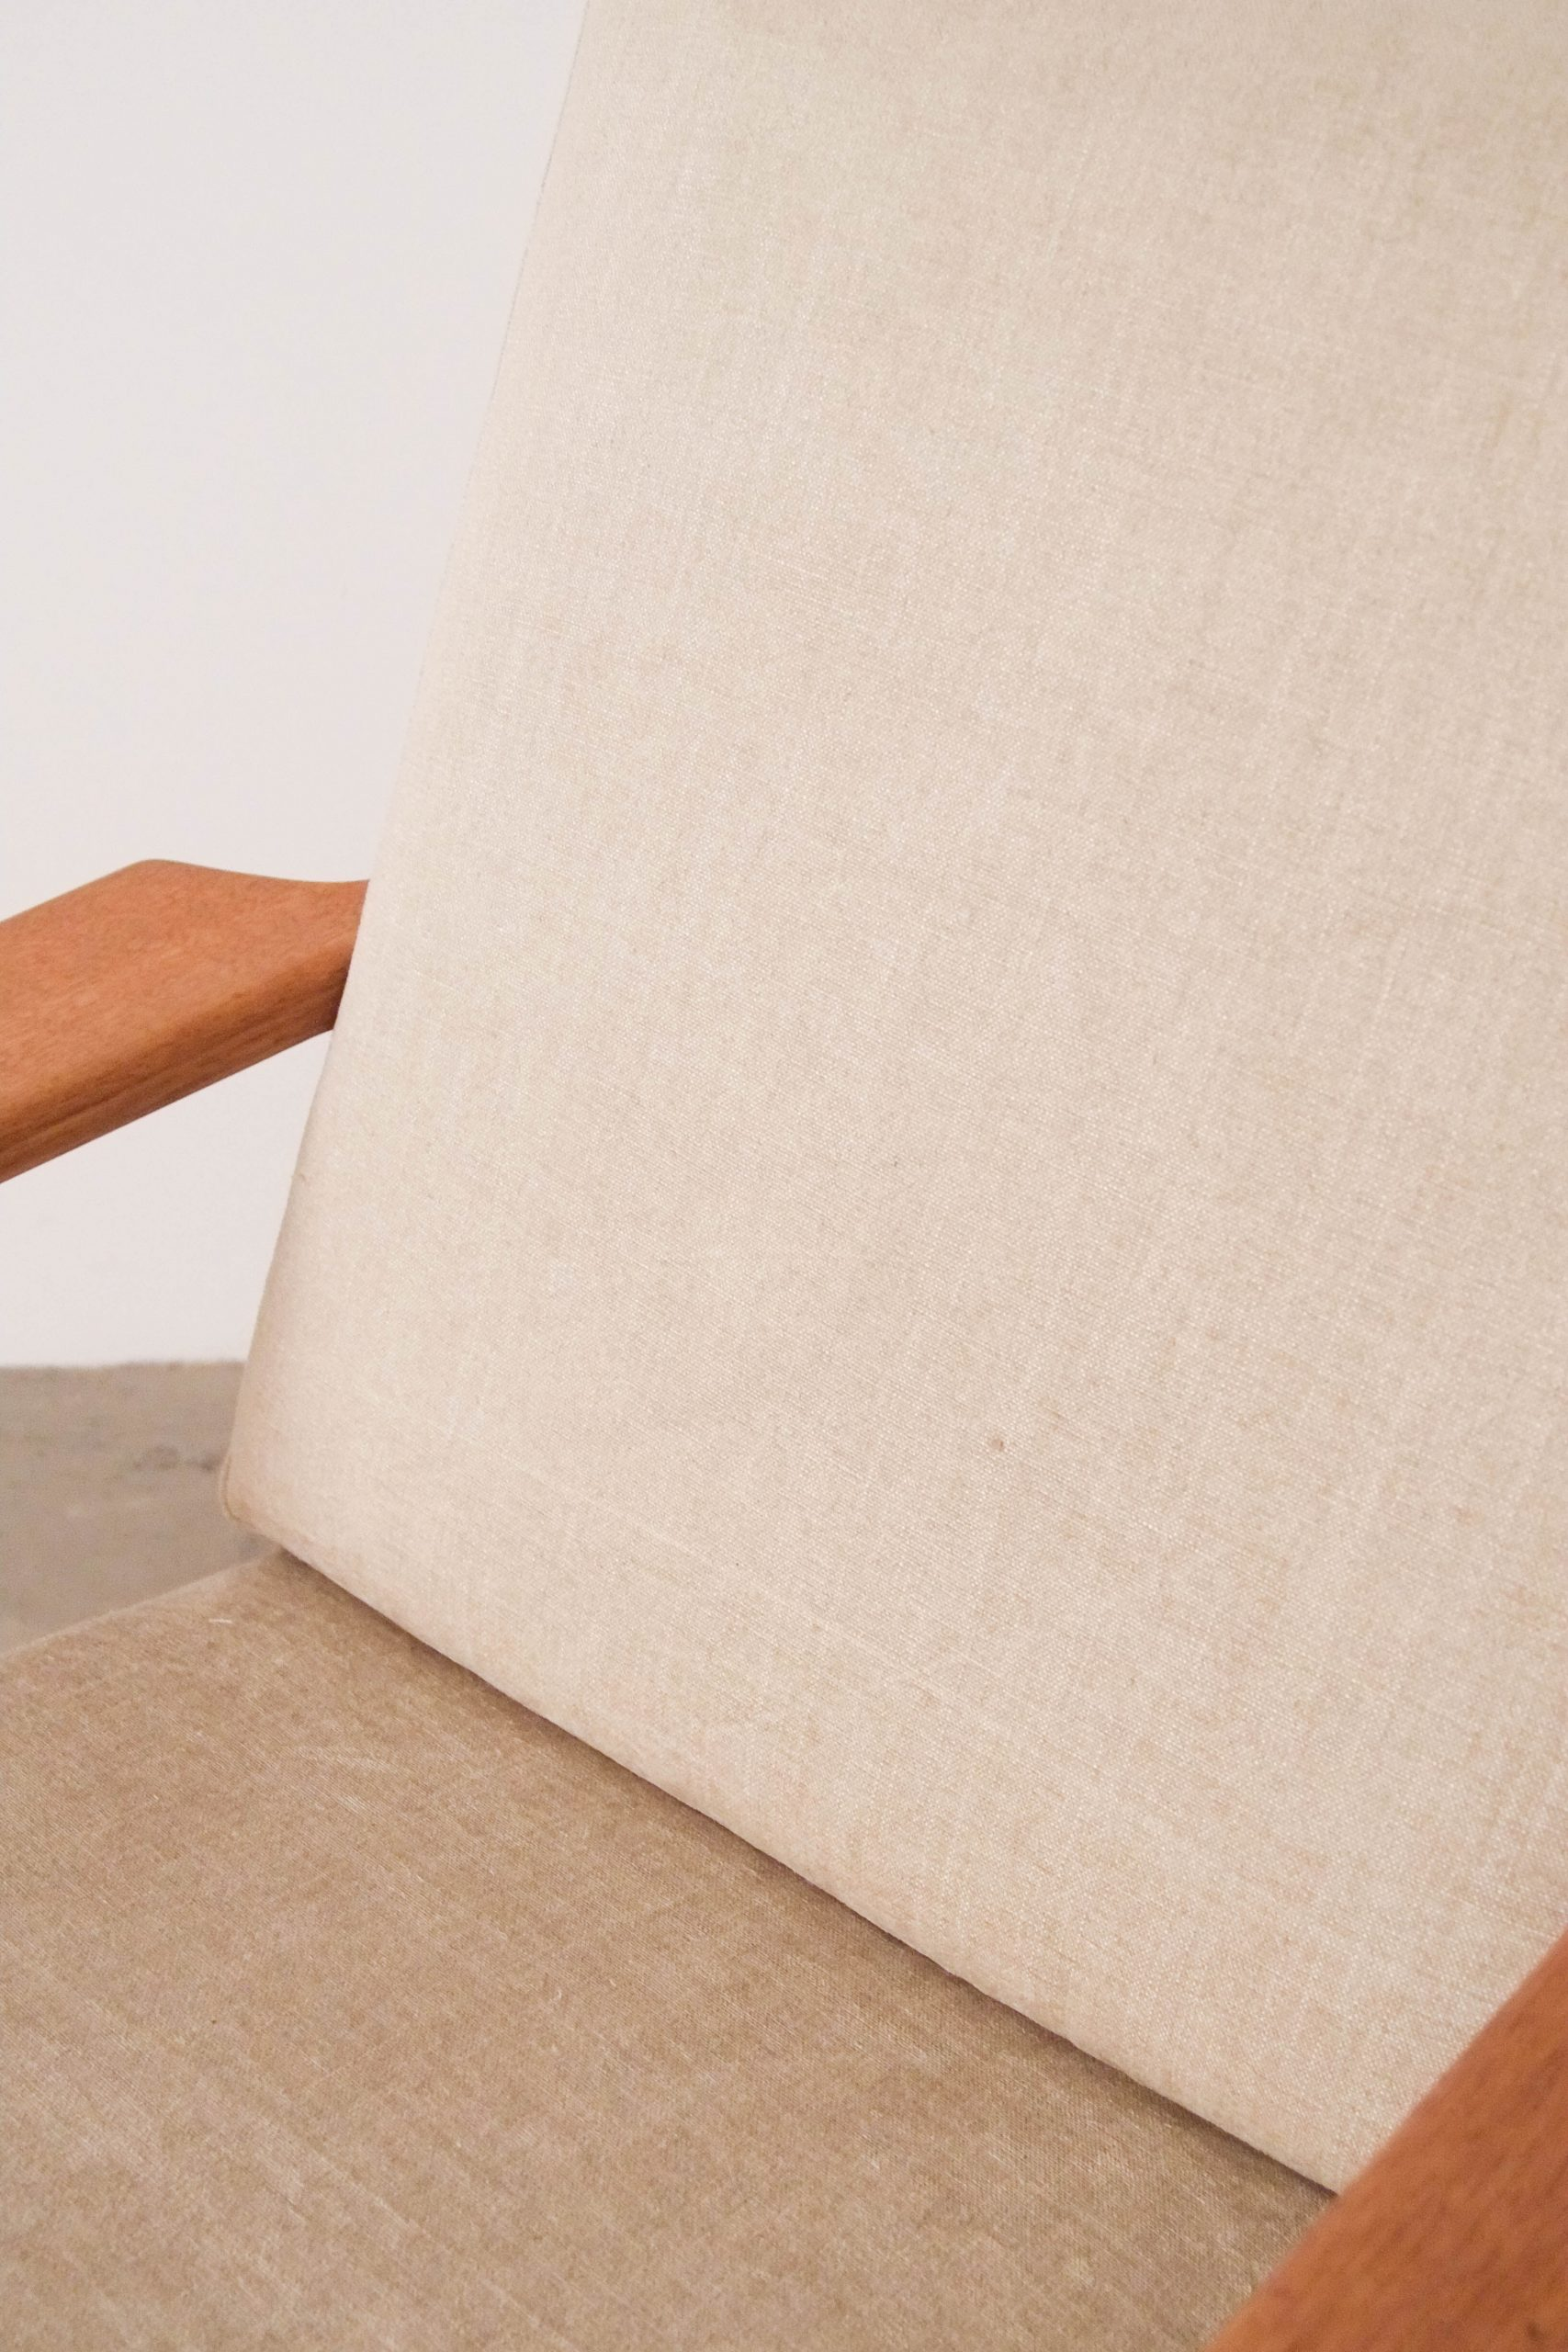 butaca tapizada de madera de roble getama hans wegner de calidad hecha a mano ebanista